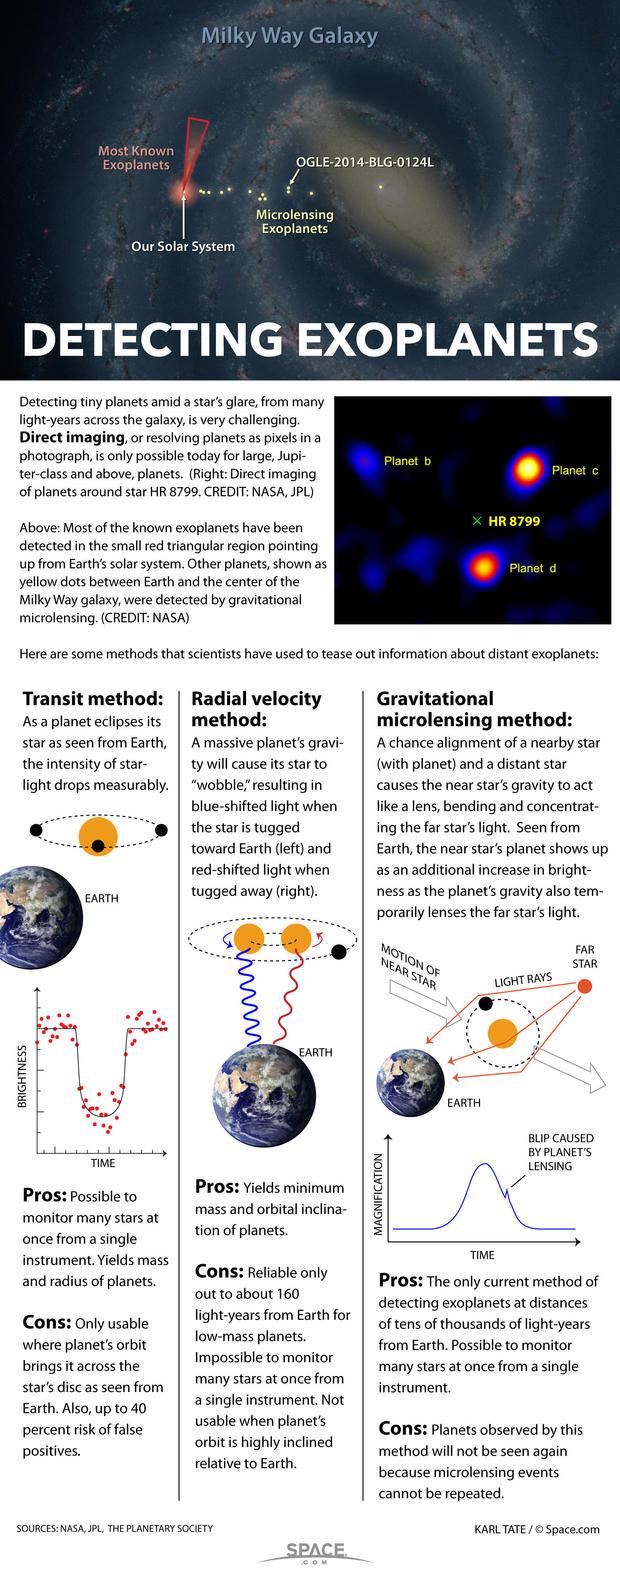 exoplanet-detection-methods-150812b-02.jpg